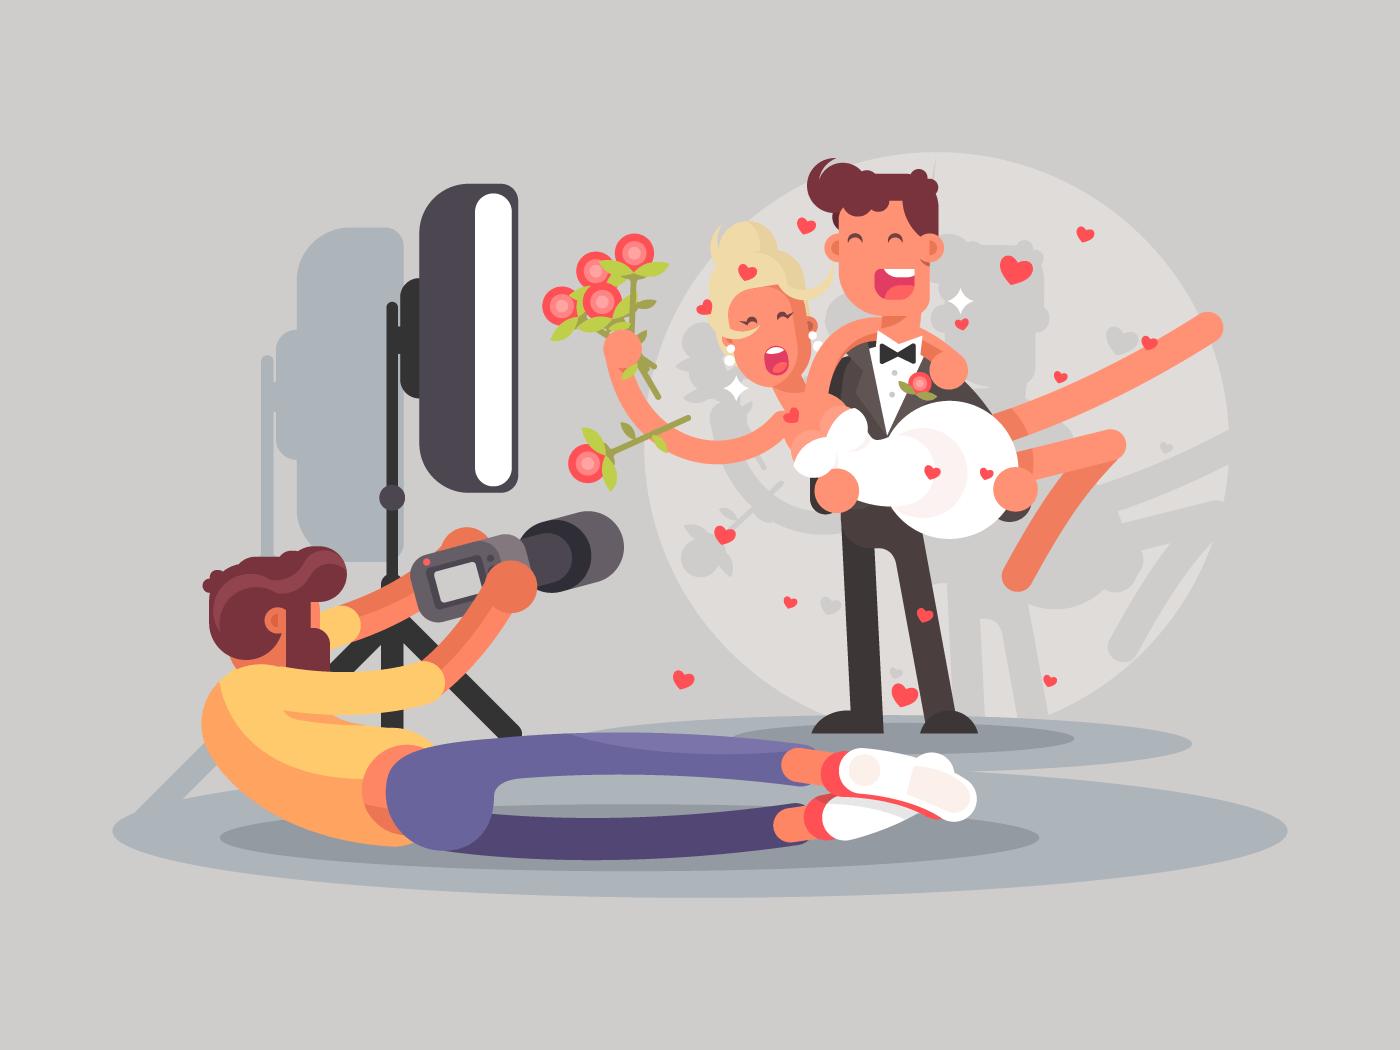 Wedding photographer flat vector illustration